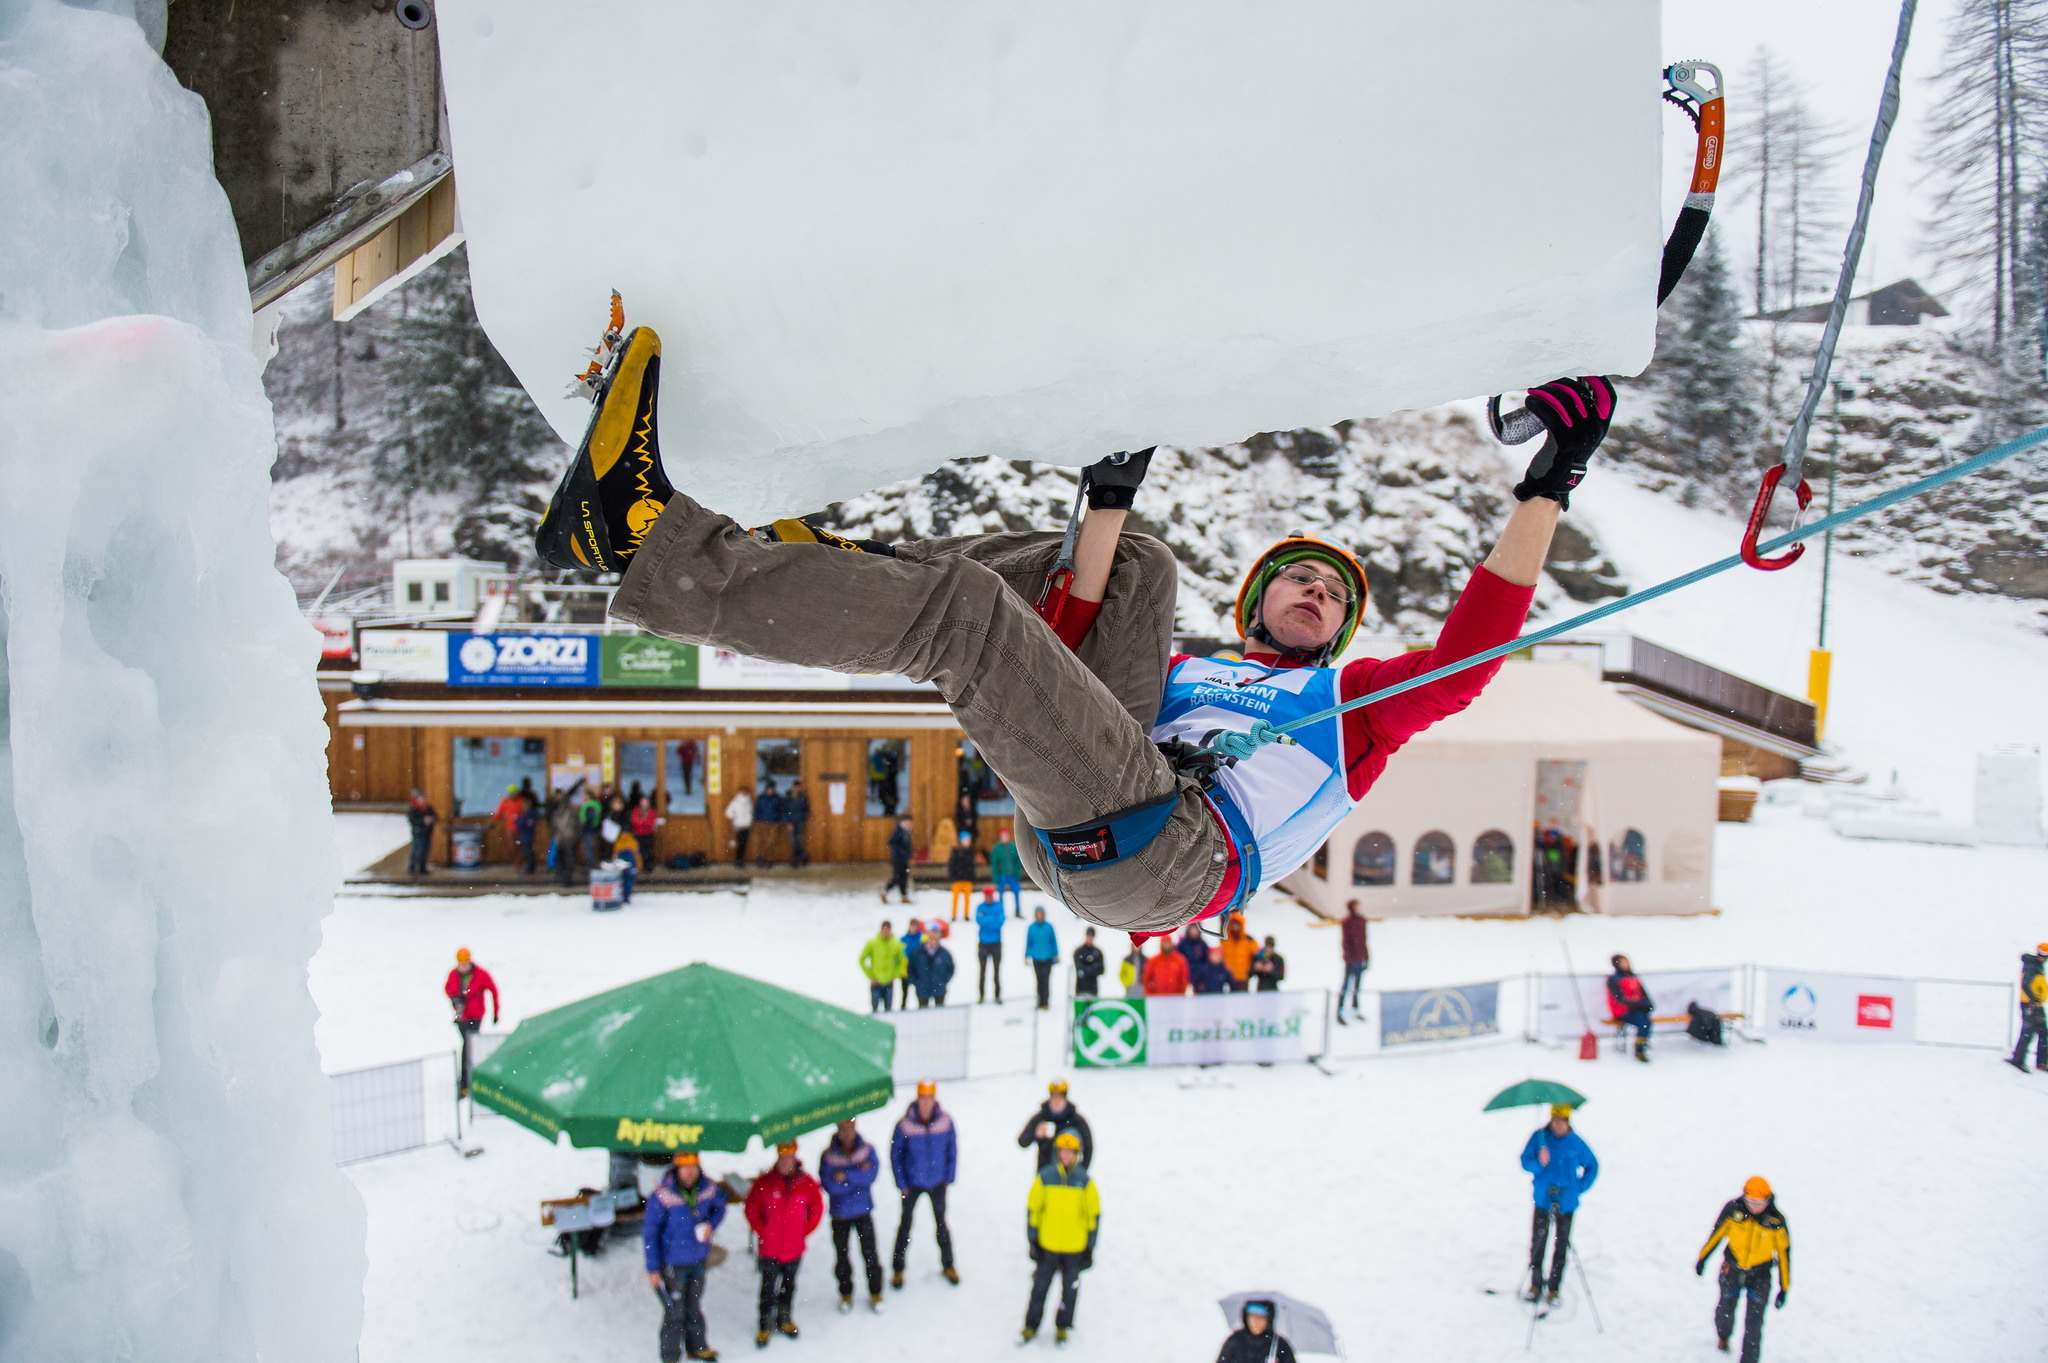 ice climbing4 Ice Climbing World Youth Championships 2016 in Rabenstein